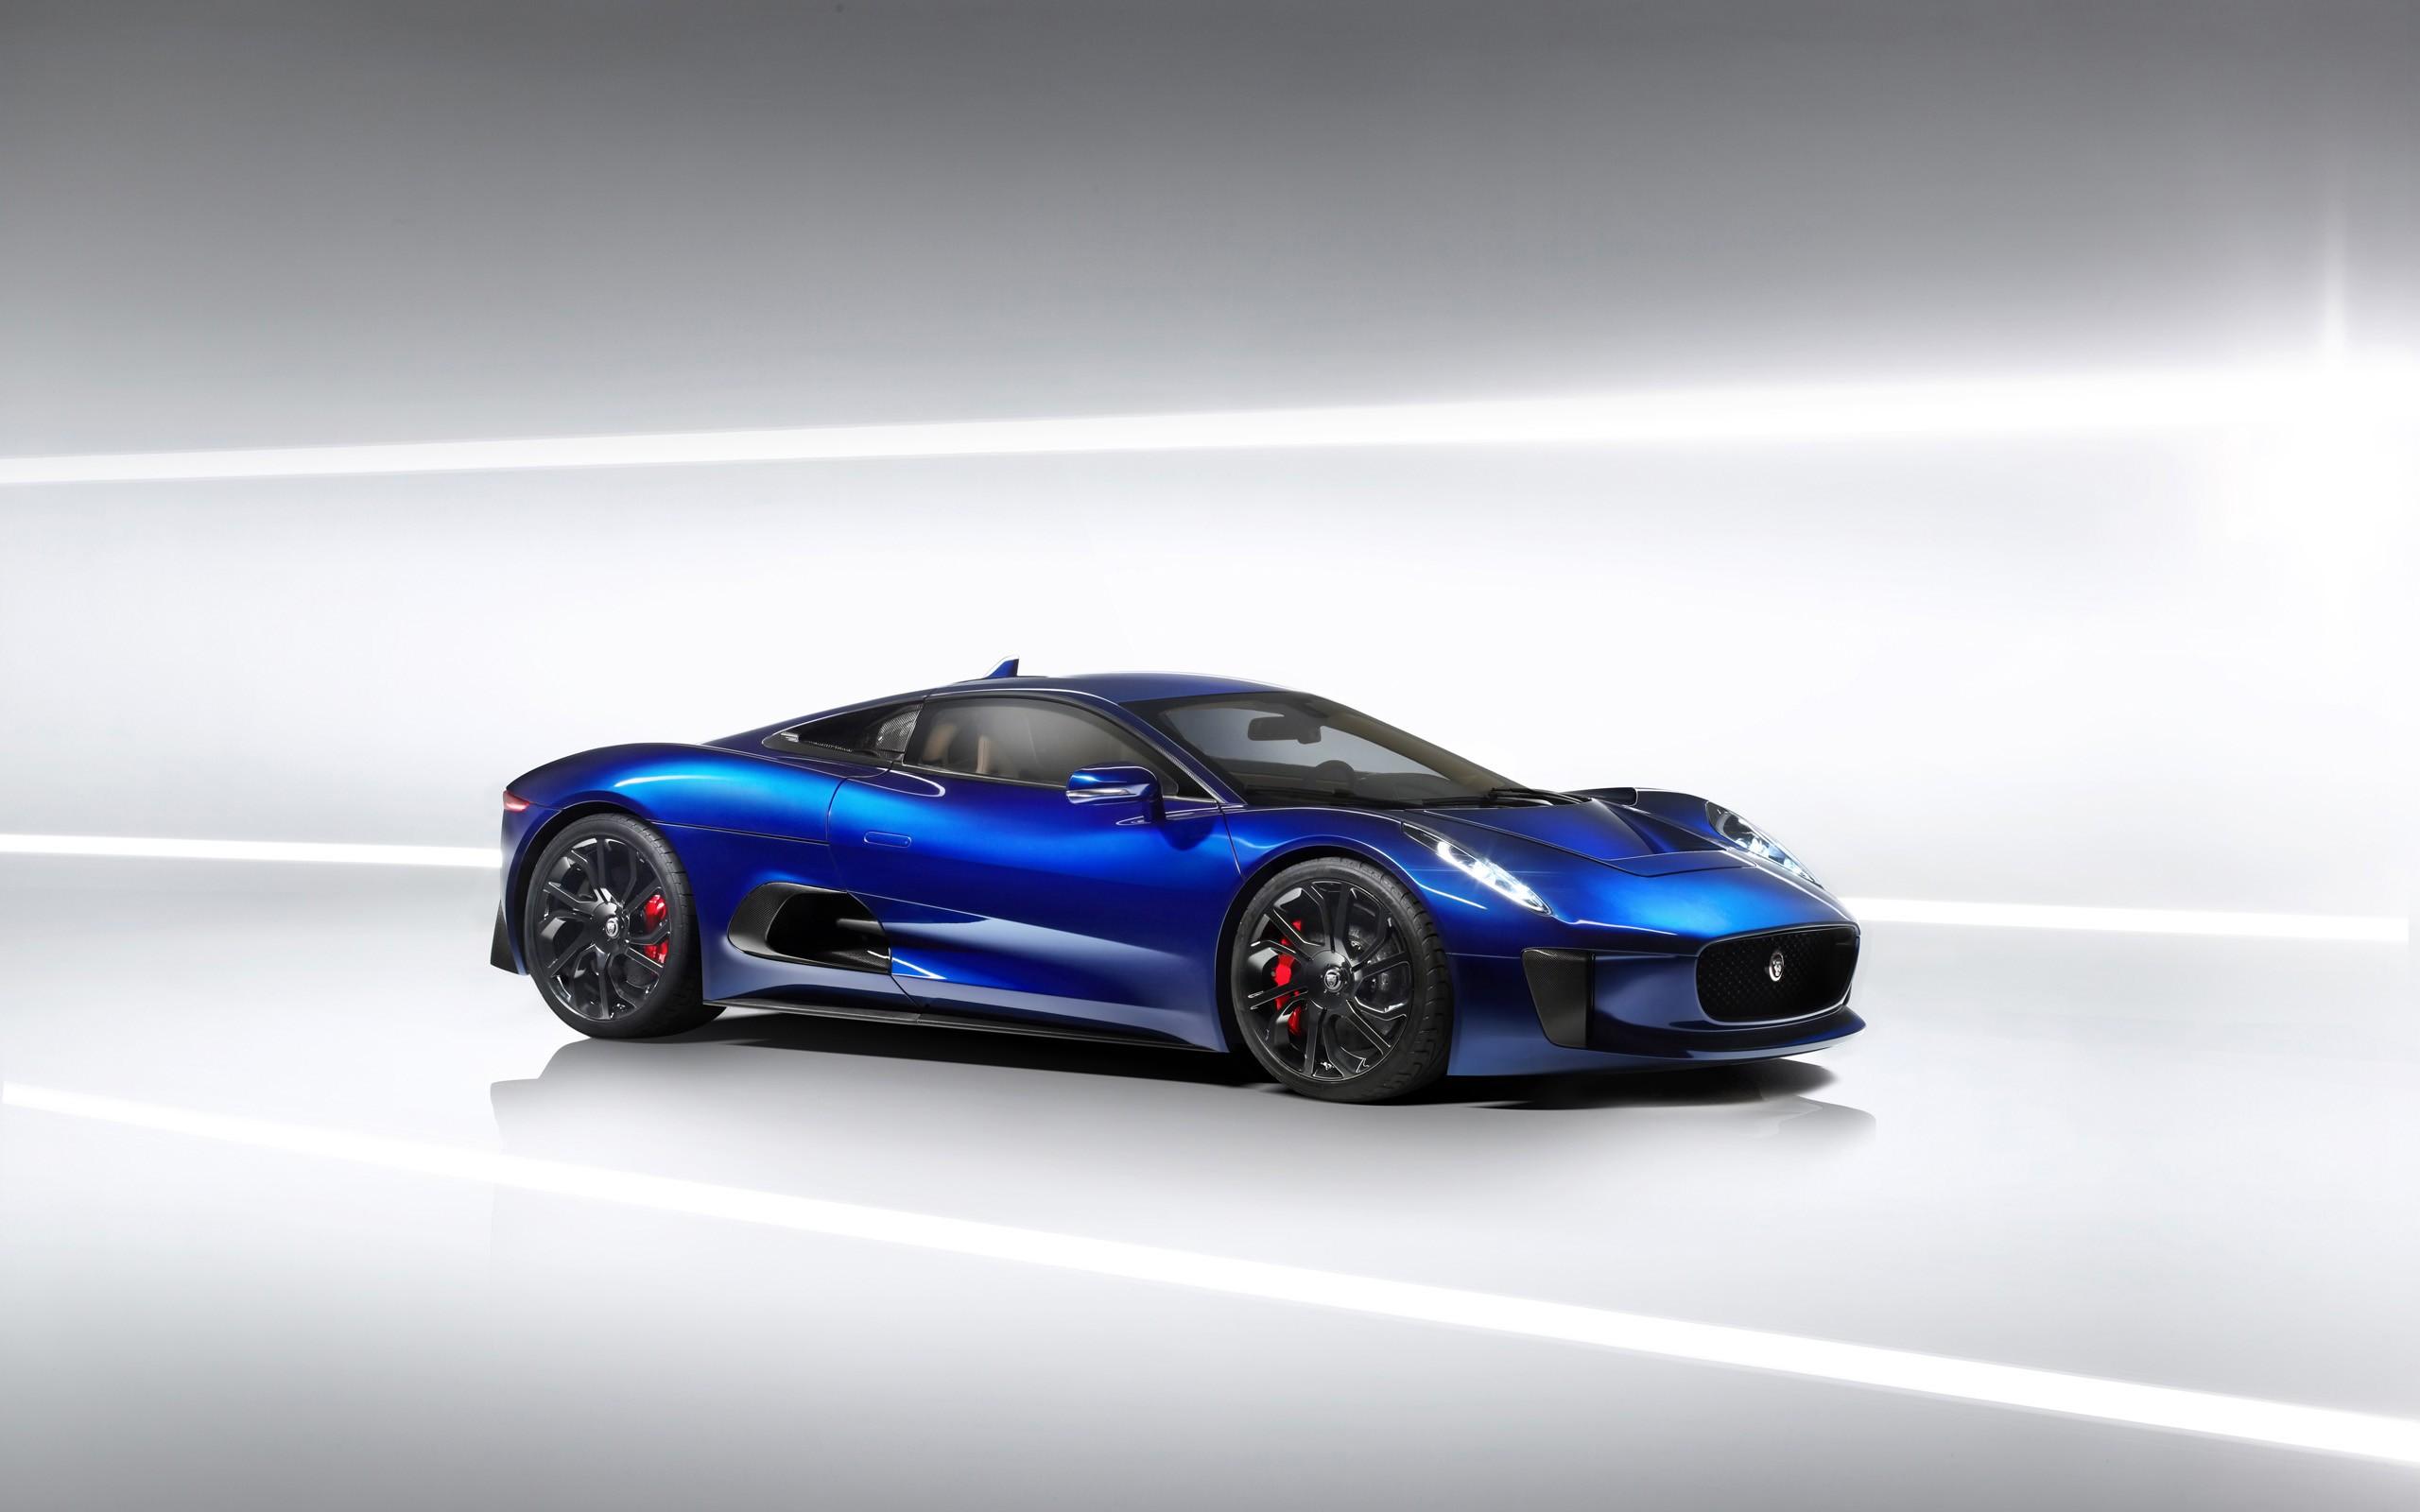 Jaguar C X75 Fondo De Pantalla Hd Fondo De Escritorio